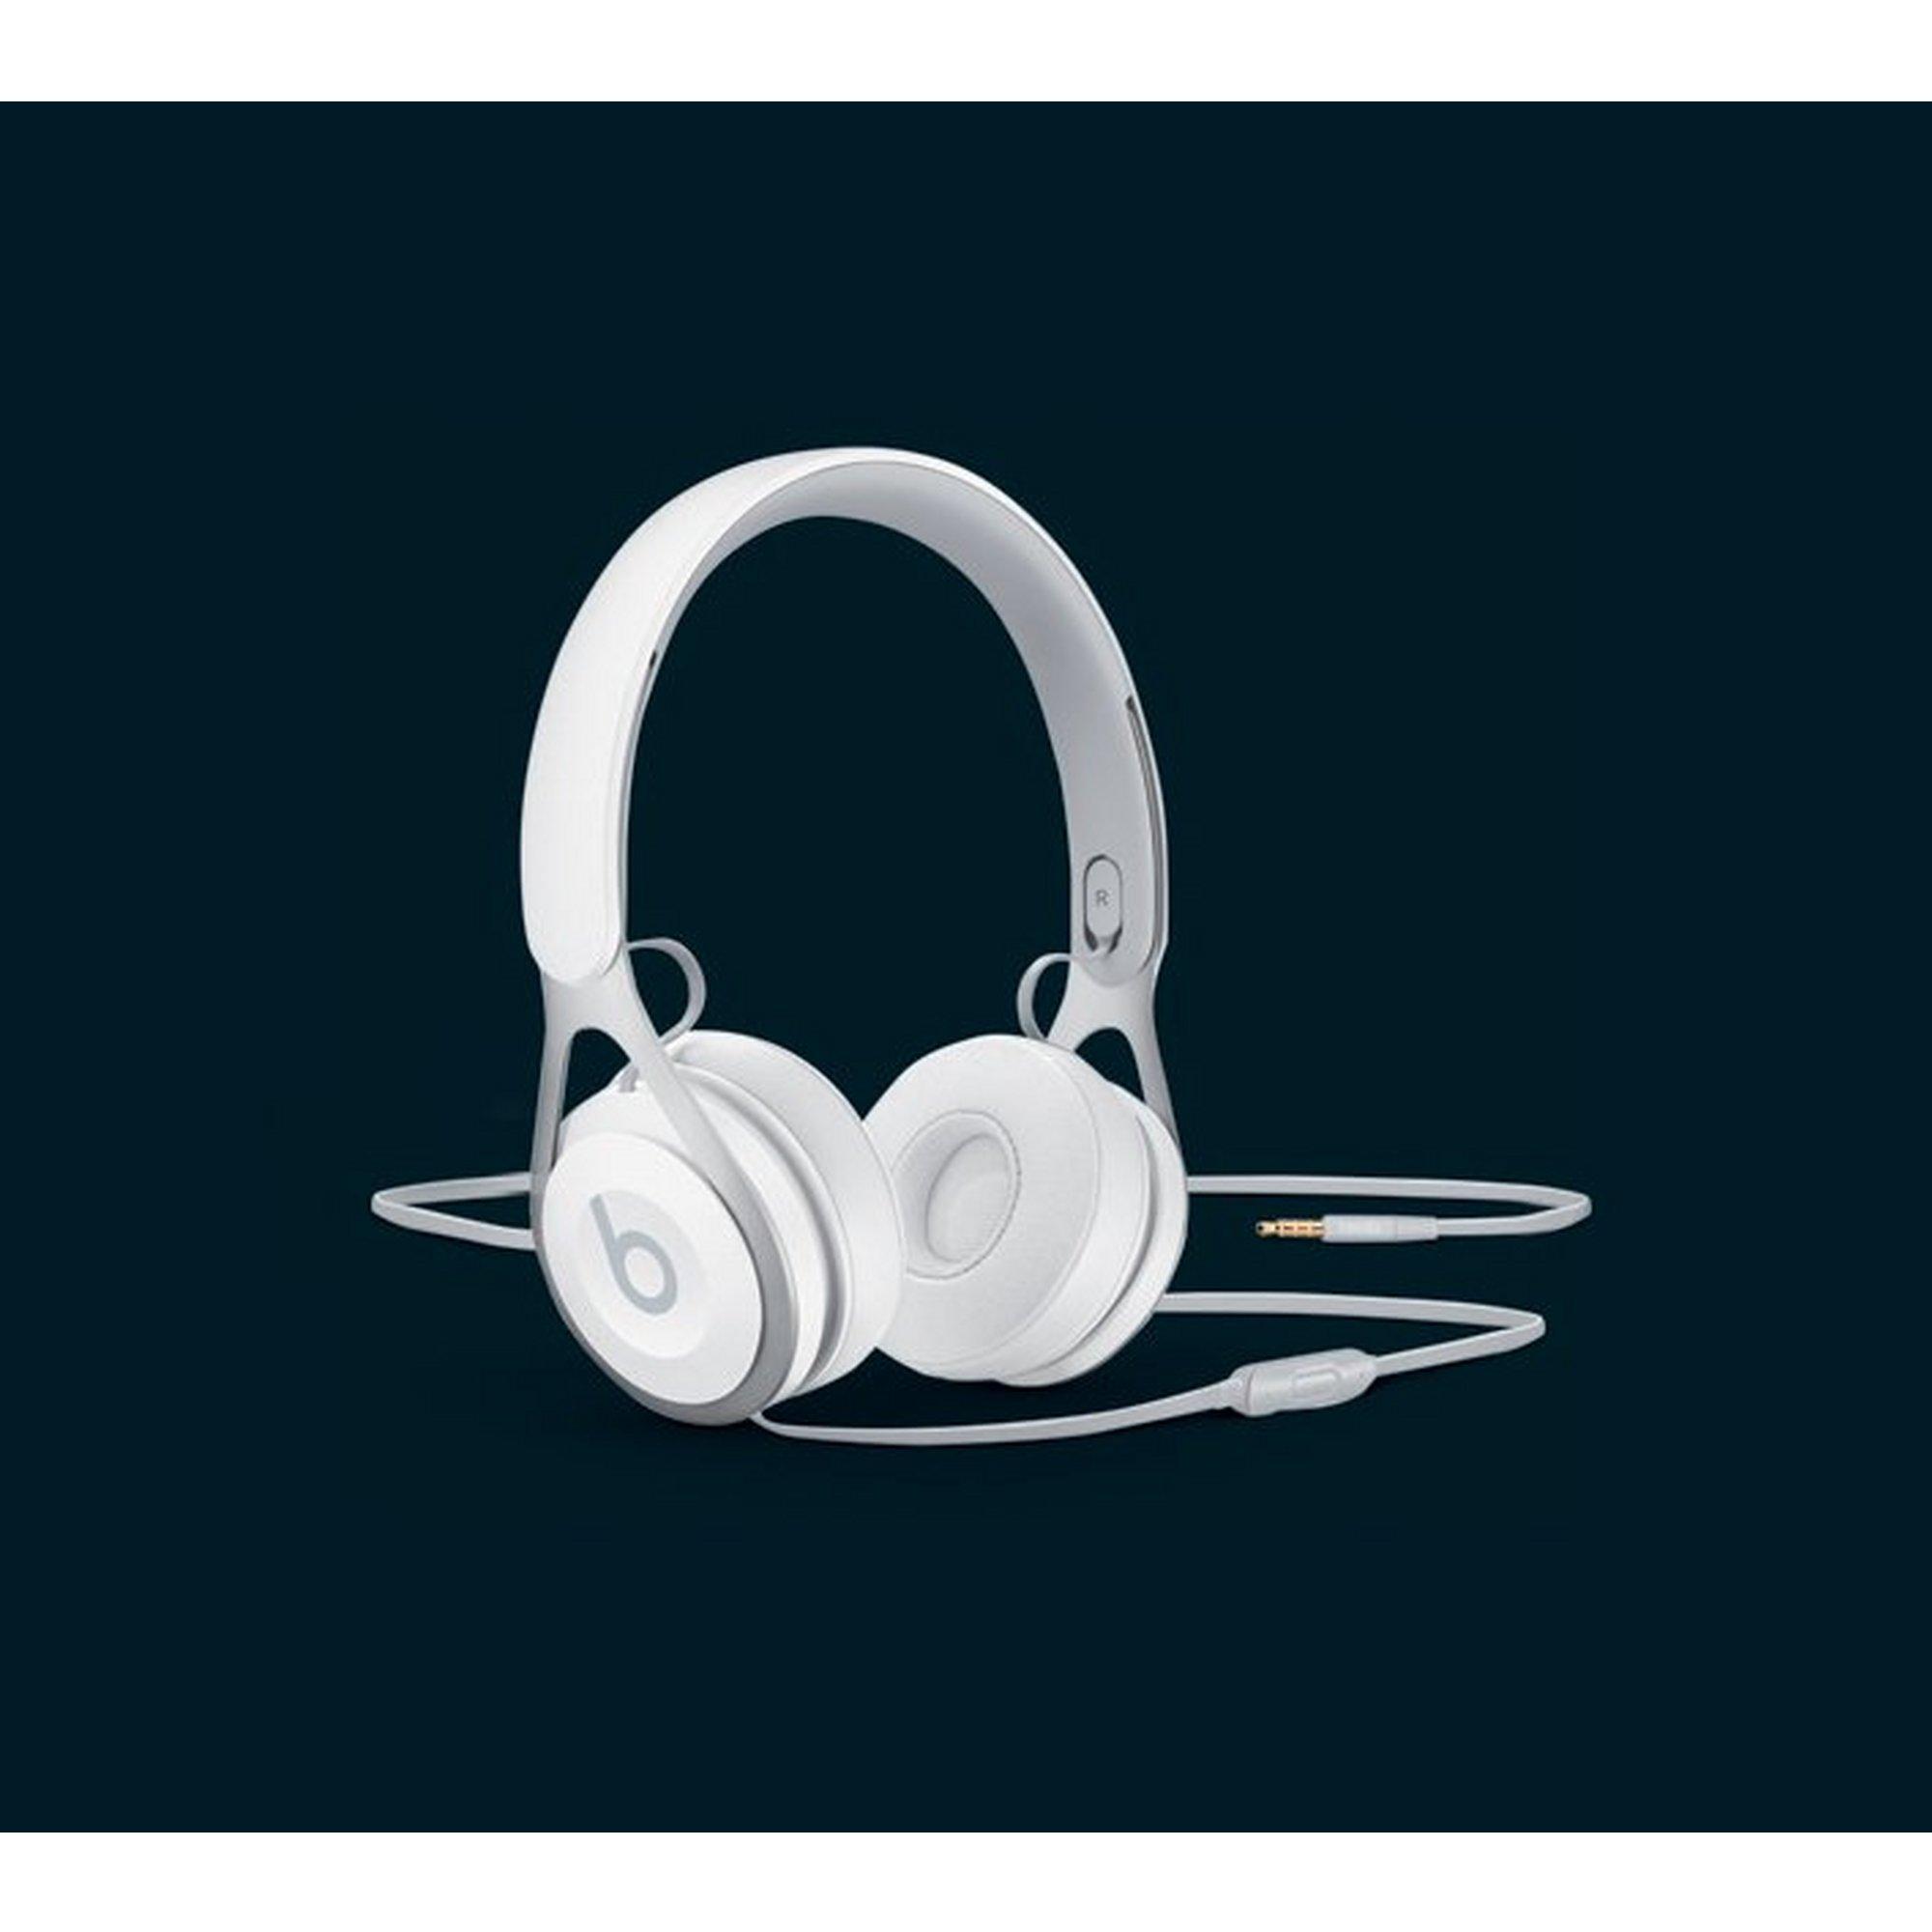 Image of Beats Ep On Ear Headphones - White